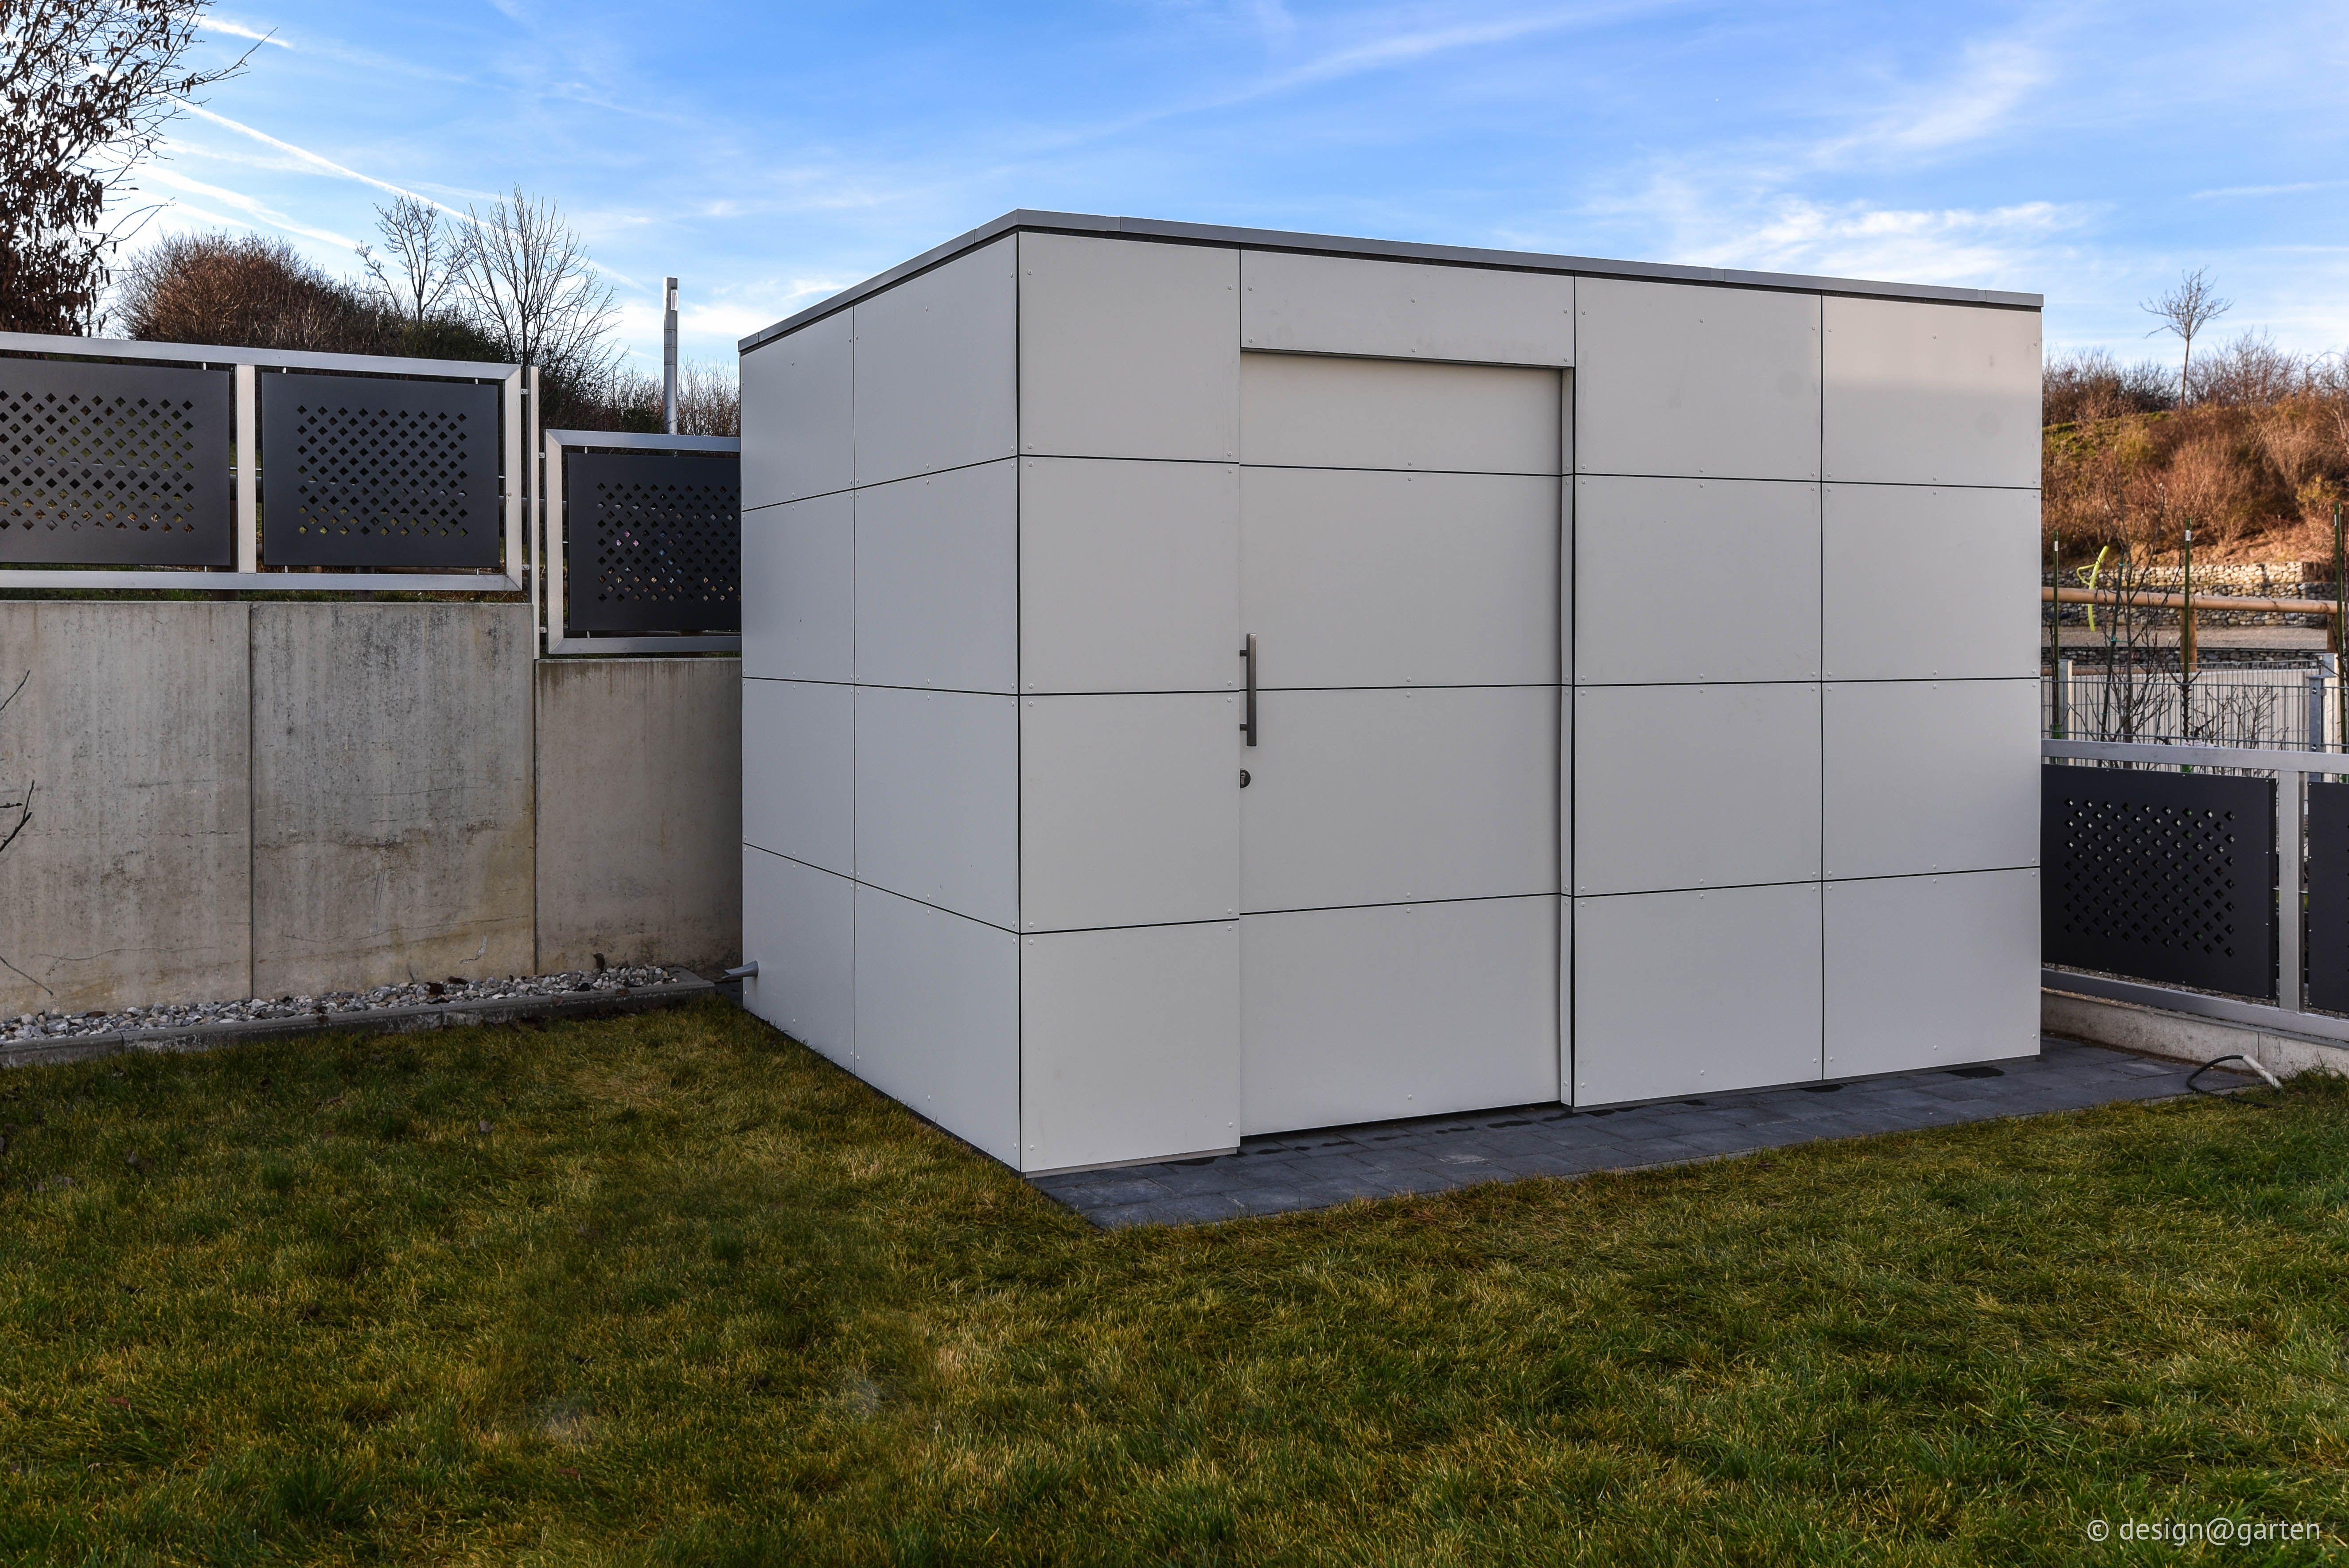 Gartenhaus Augsburg pool bauen augsburg   gartenhaus gart lounge köln modern garden shed